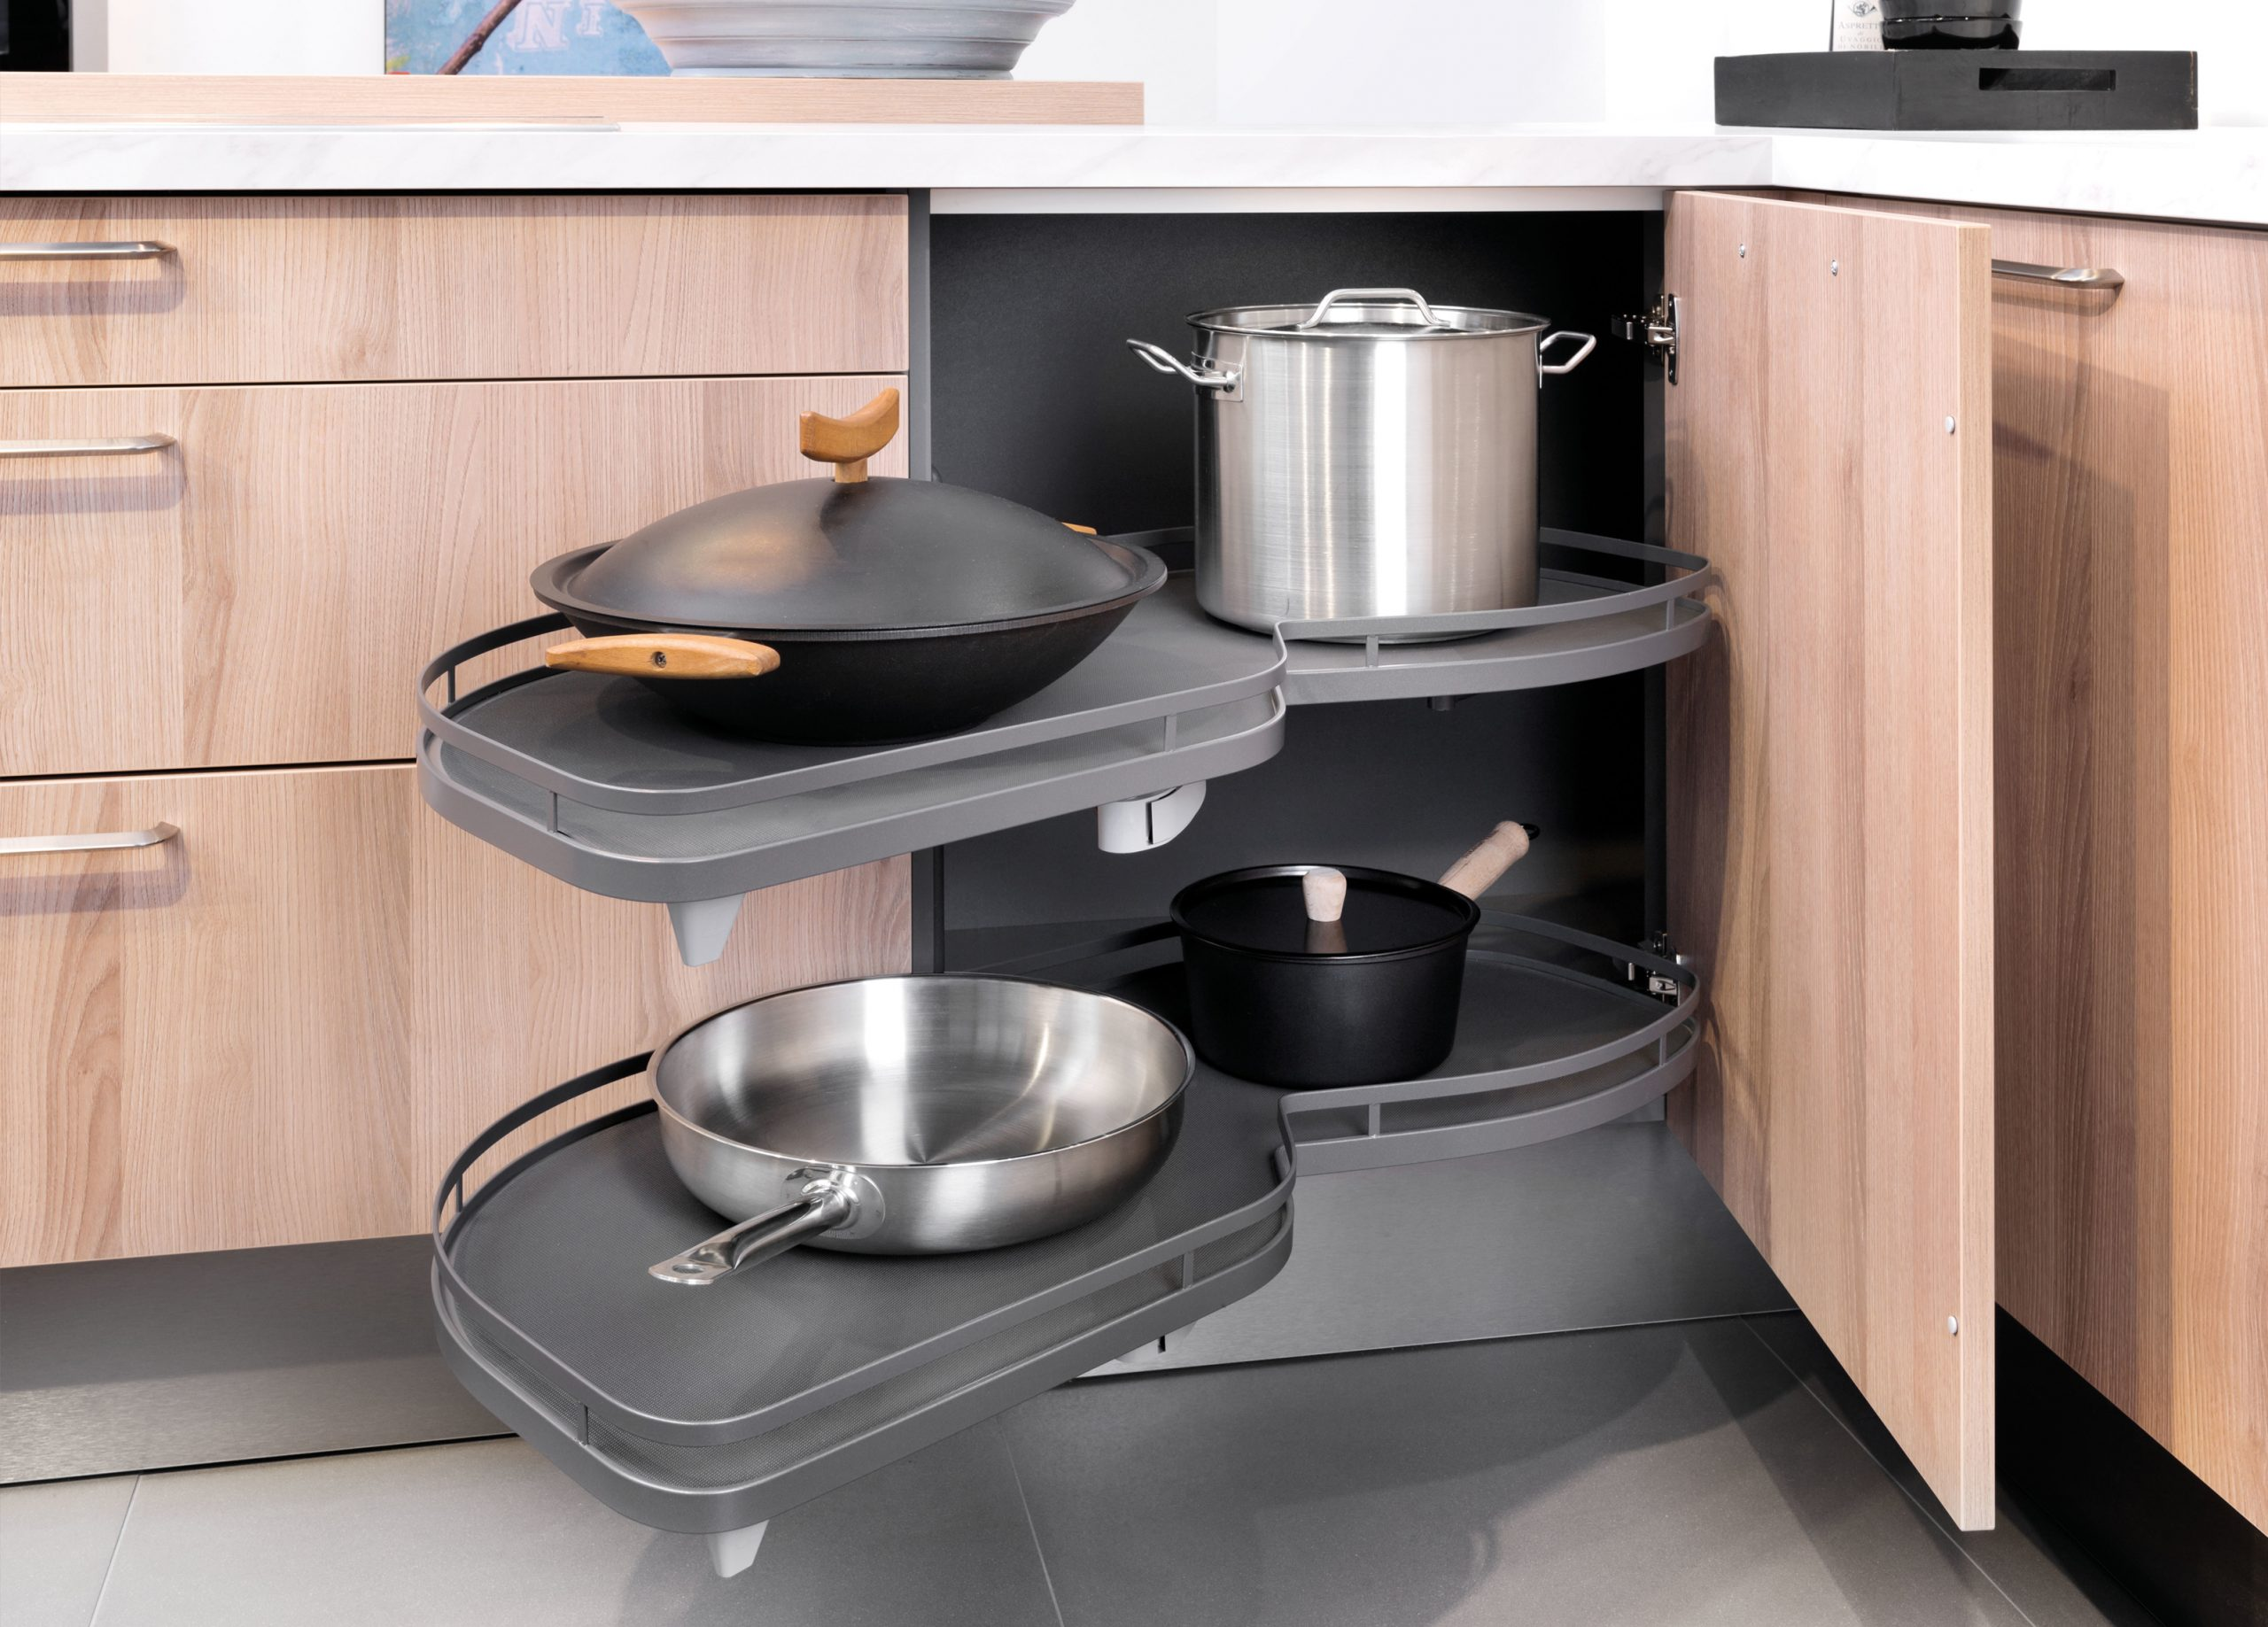 Full Size of Unterschränke Küche Hornbach Unterschränke Küche Ikea Unterschränke Küche Selber Bauen Unterschränke Küche Ohne Arbeitsplatte Küche Unterschränke Küche